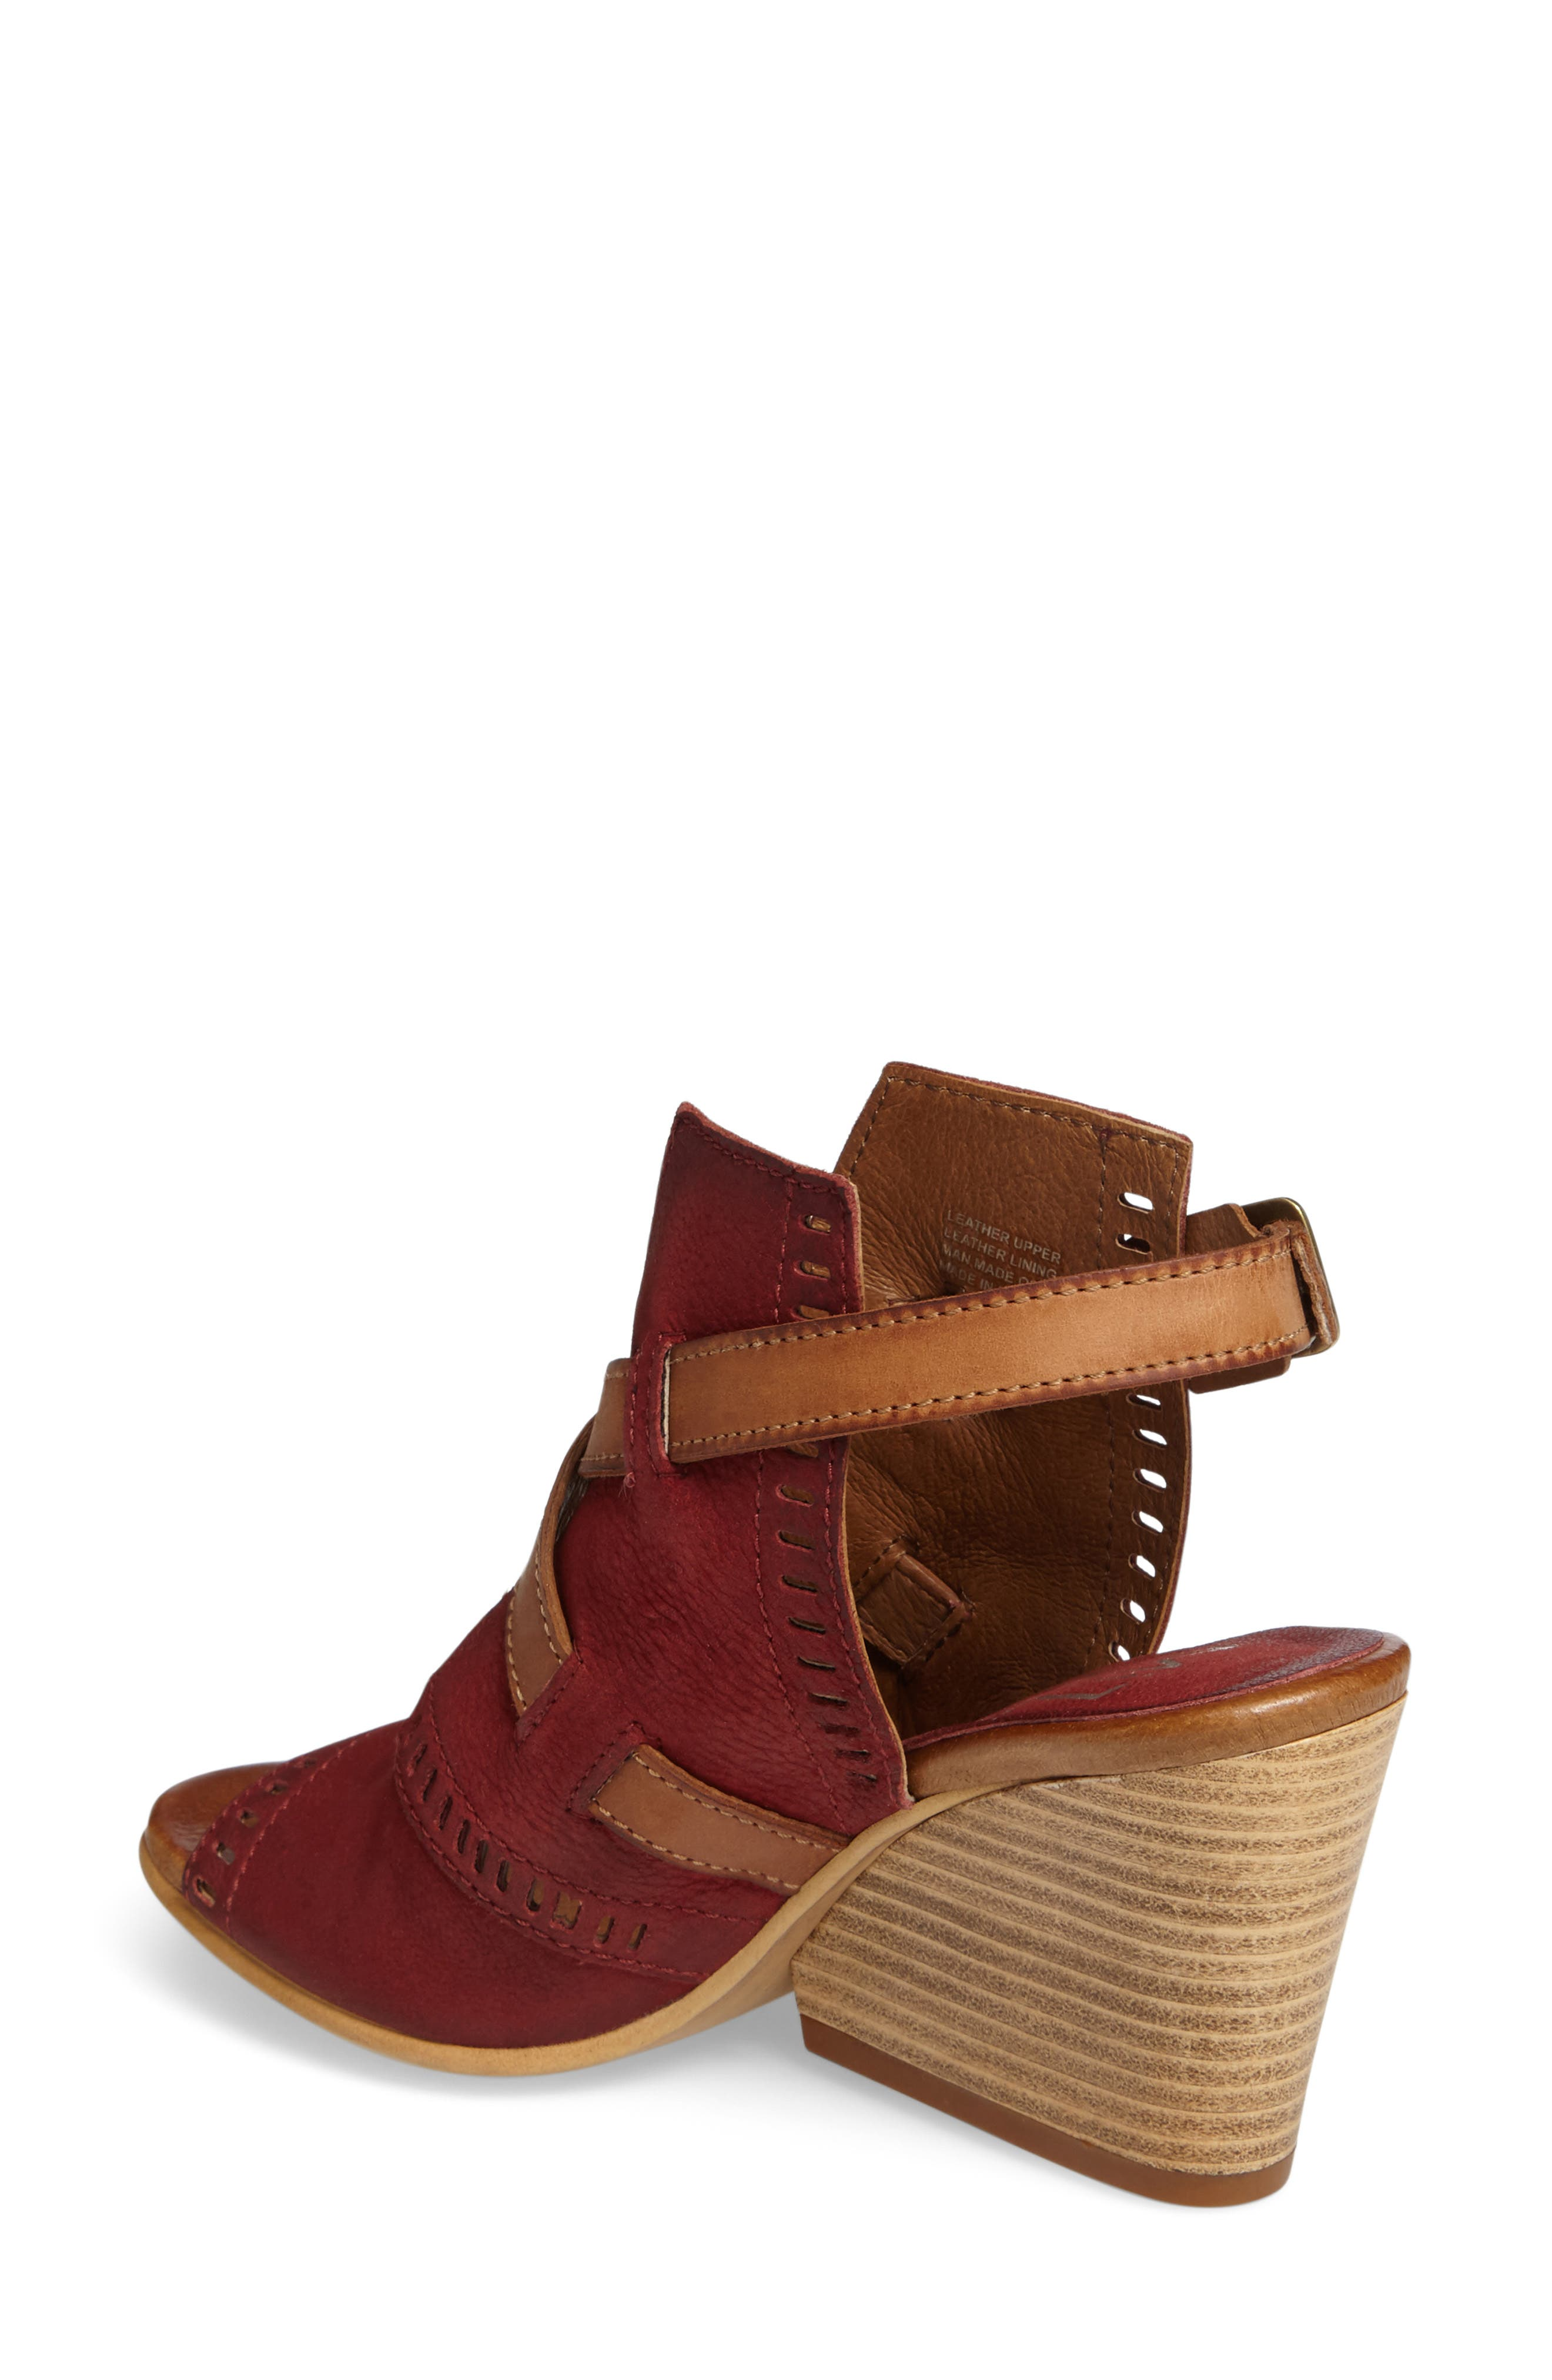 Kipling Perforated Sandal,                             Alternate thumbnail 8, color,